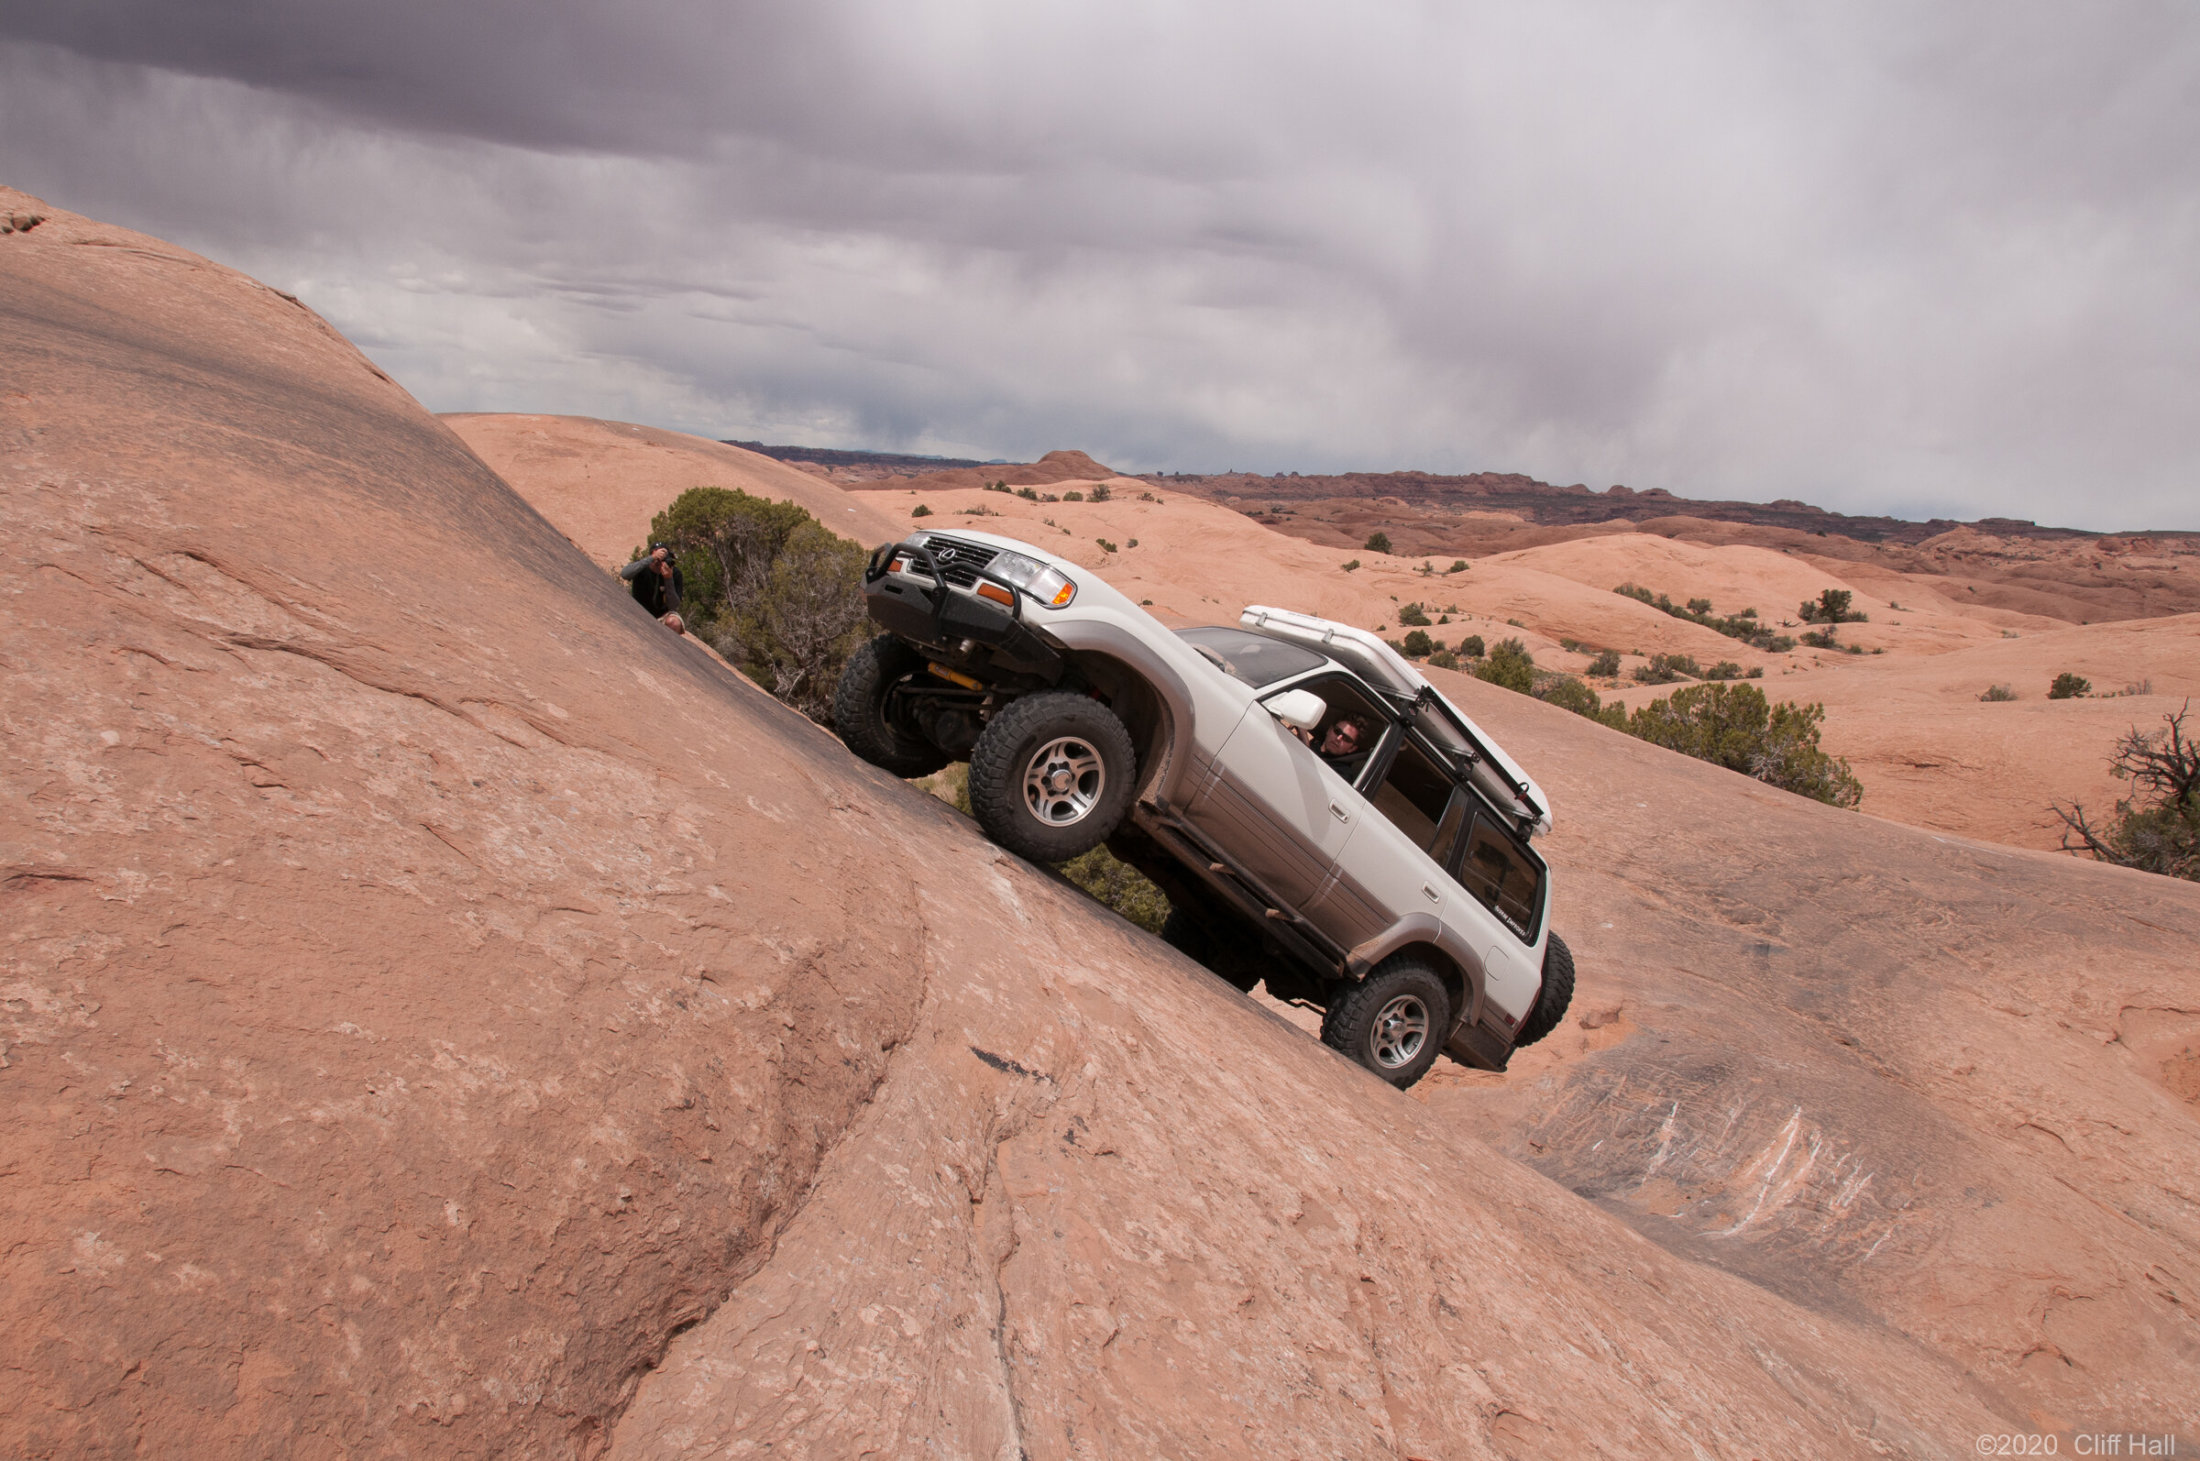 Some pretty steep stuff